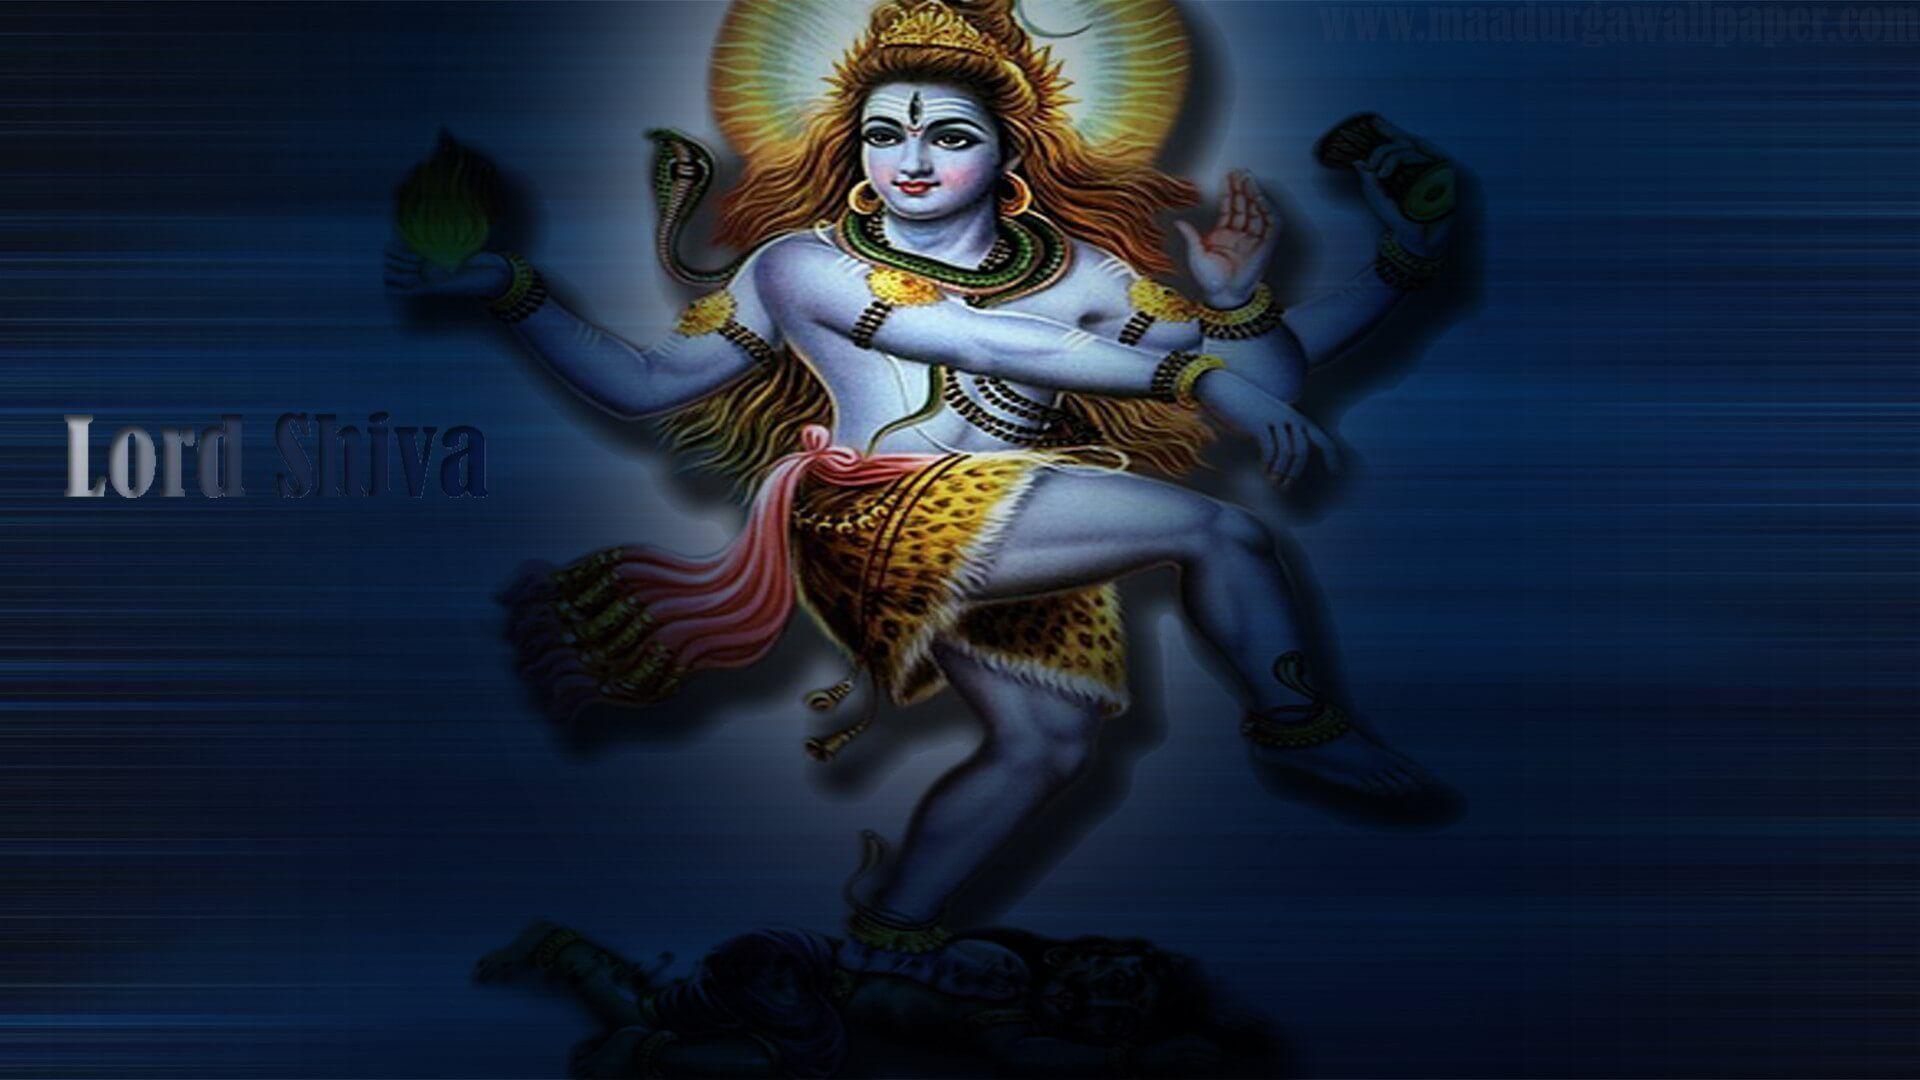 Lord Shiva 4k Wallpapers - Top Free Lord Shiva 4k ...